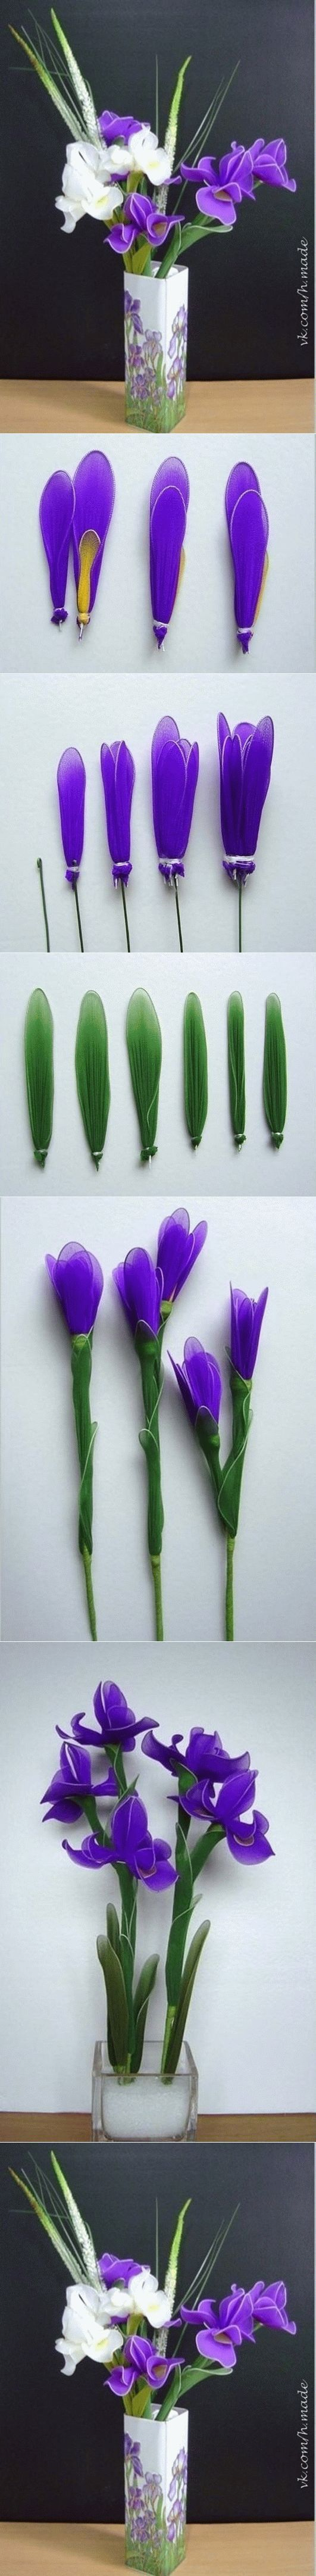 DIY Easy Wrapped Nylon Flowers